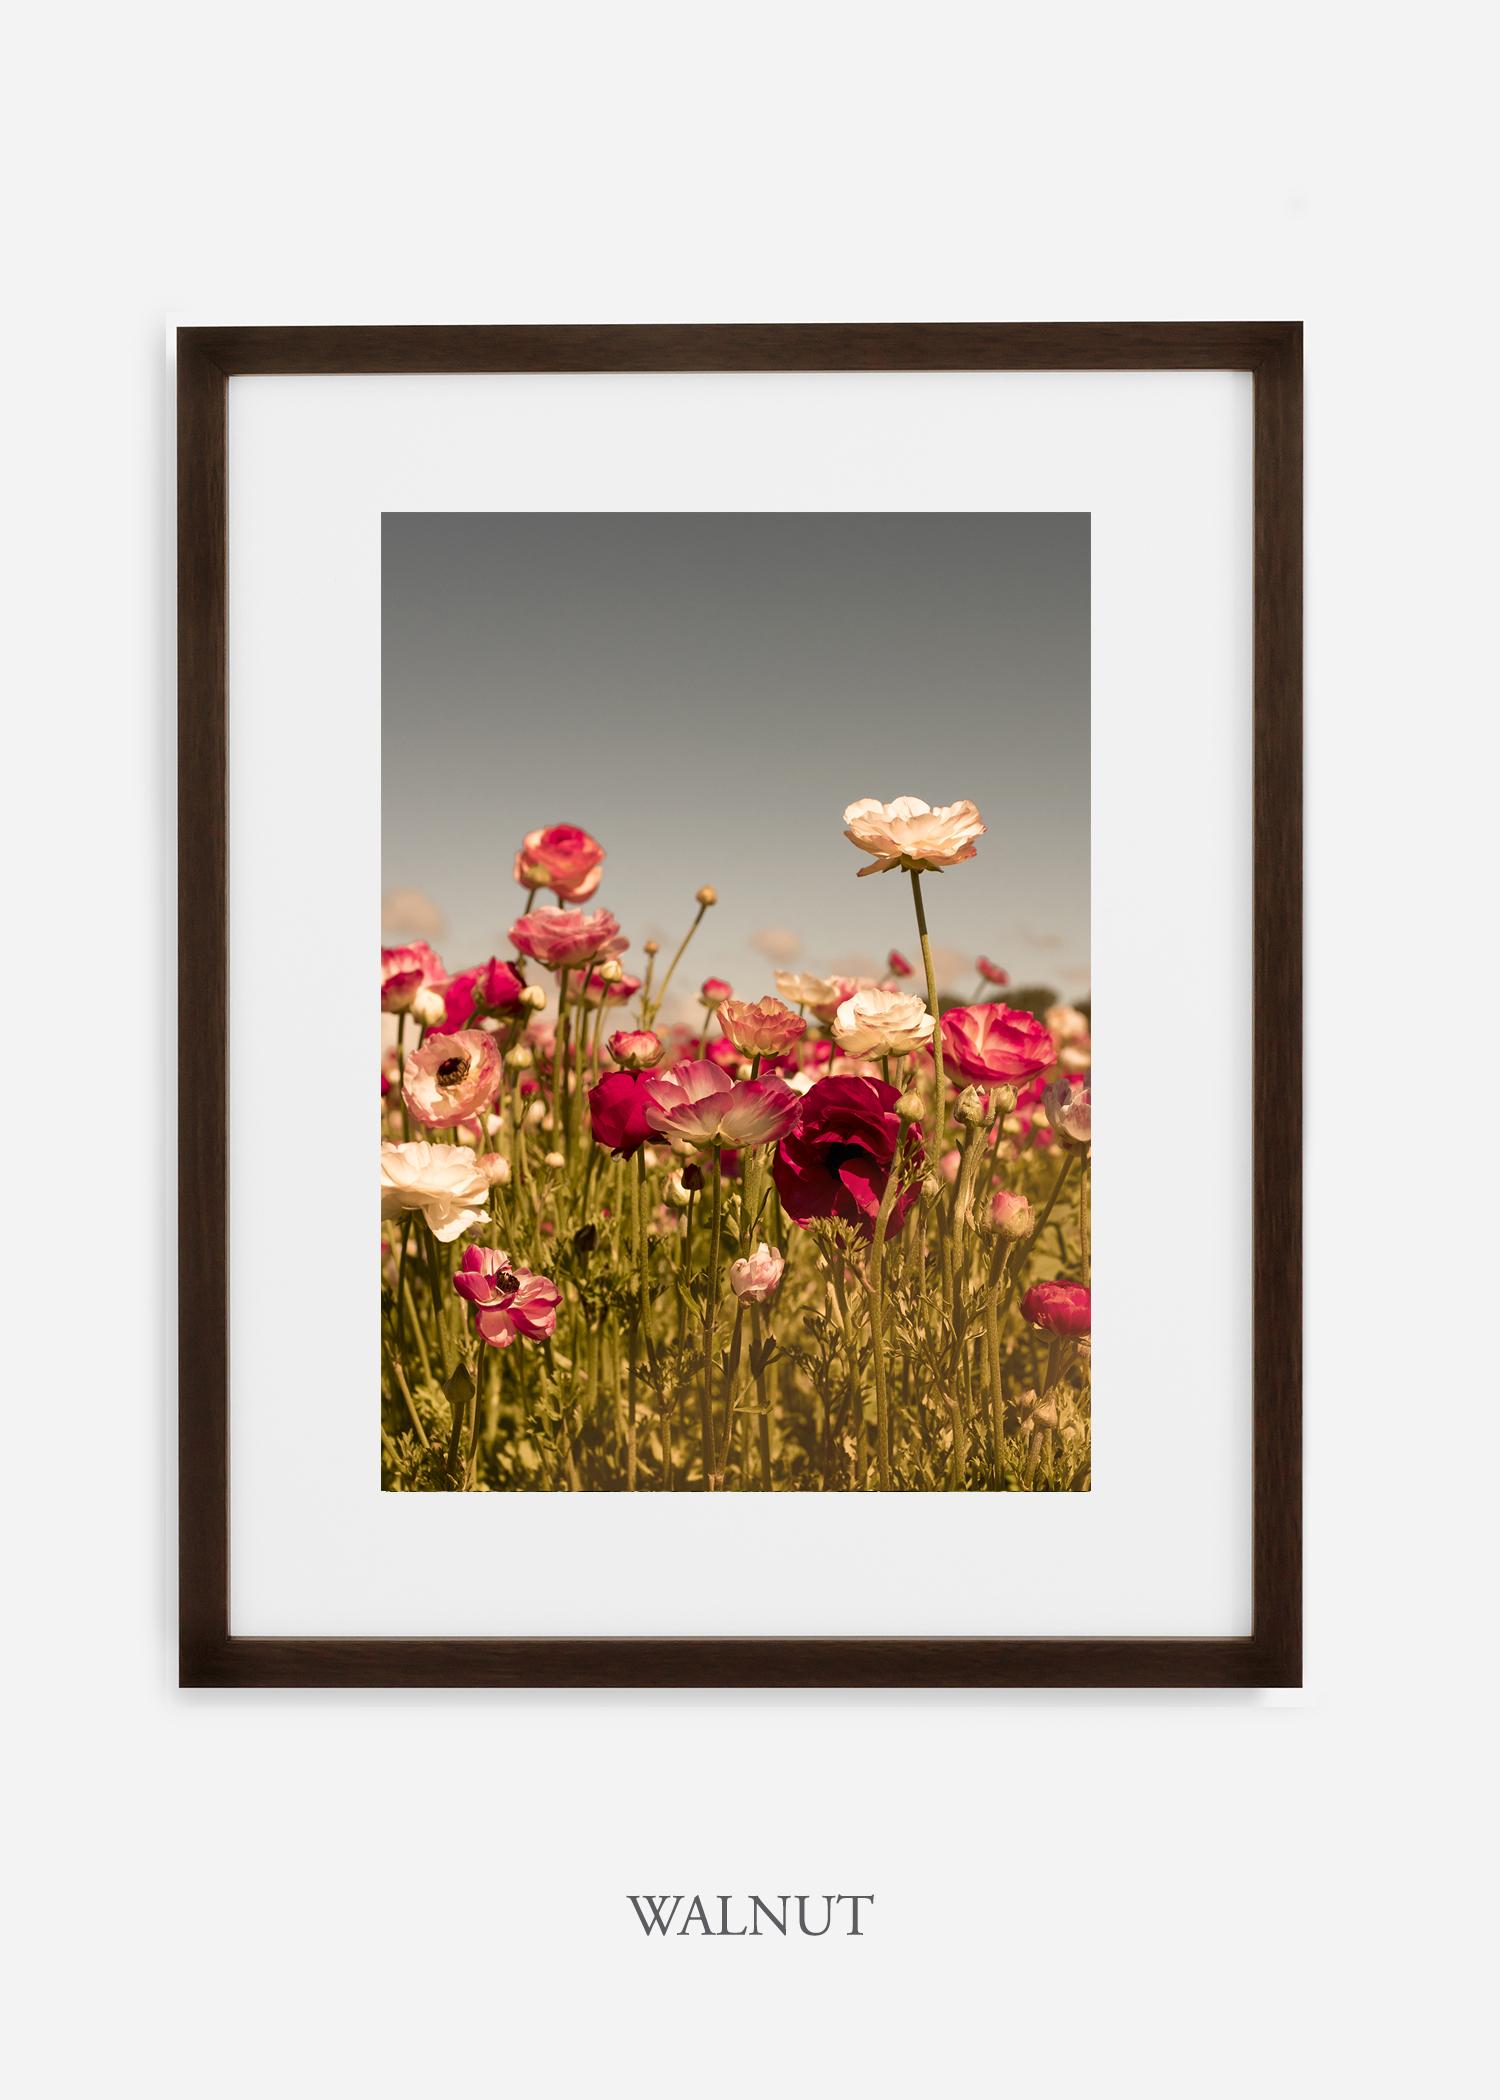 wilder-california-Floral-No.3-walnut-frame-mat-interior-design-botanical-print-art-floral-art.jpg